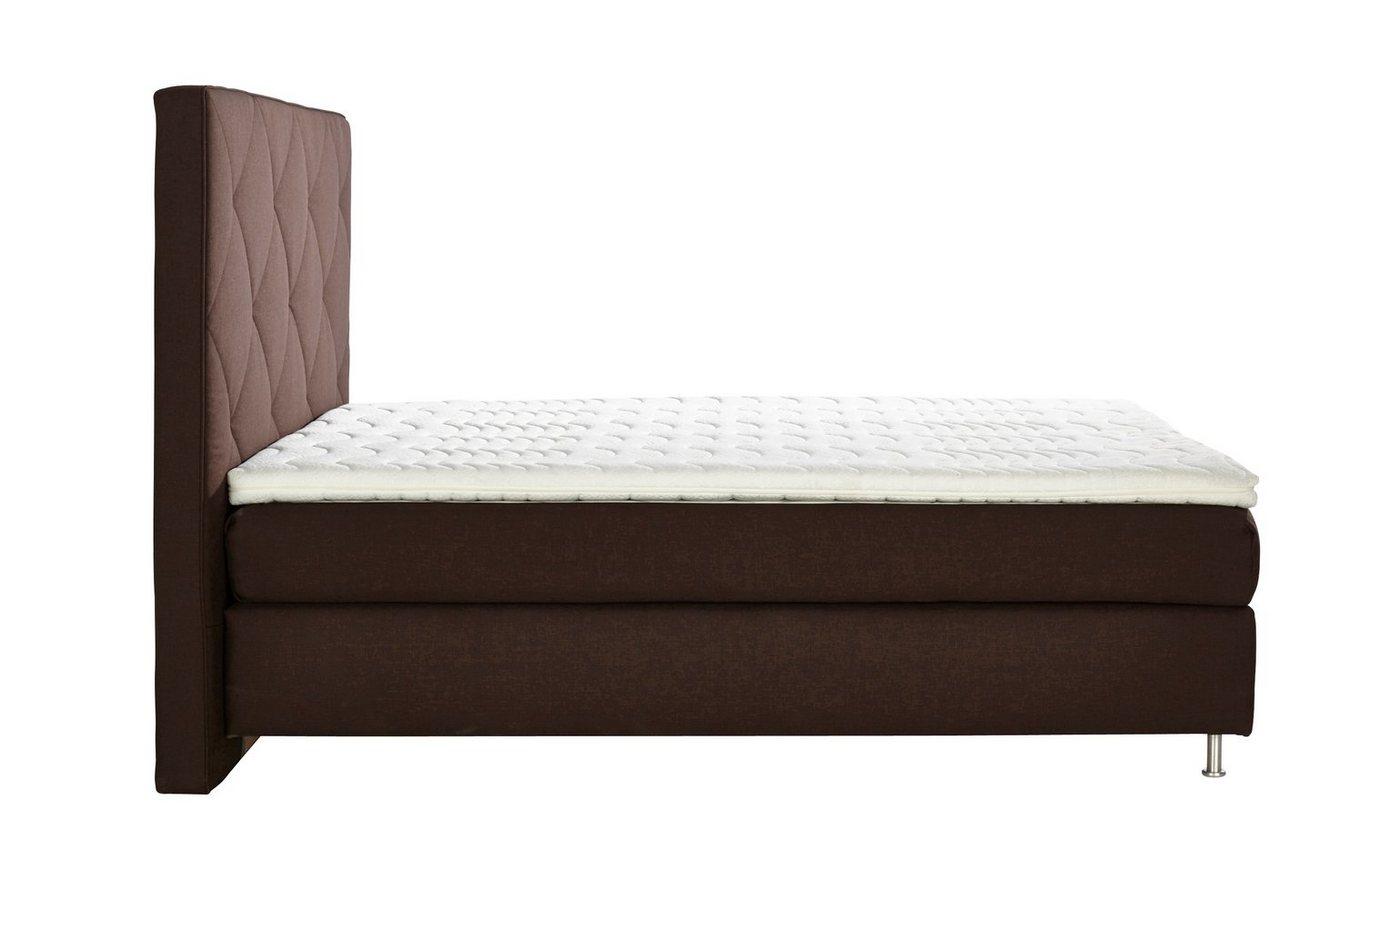 ADA premium Boxspringbett »Oriental«, mit hohem Kopfteil in Rautenoptik, 3 Größen